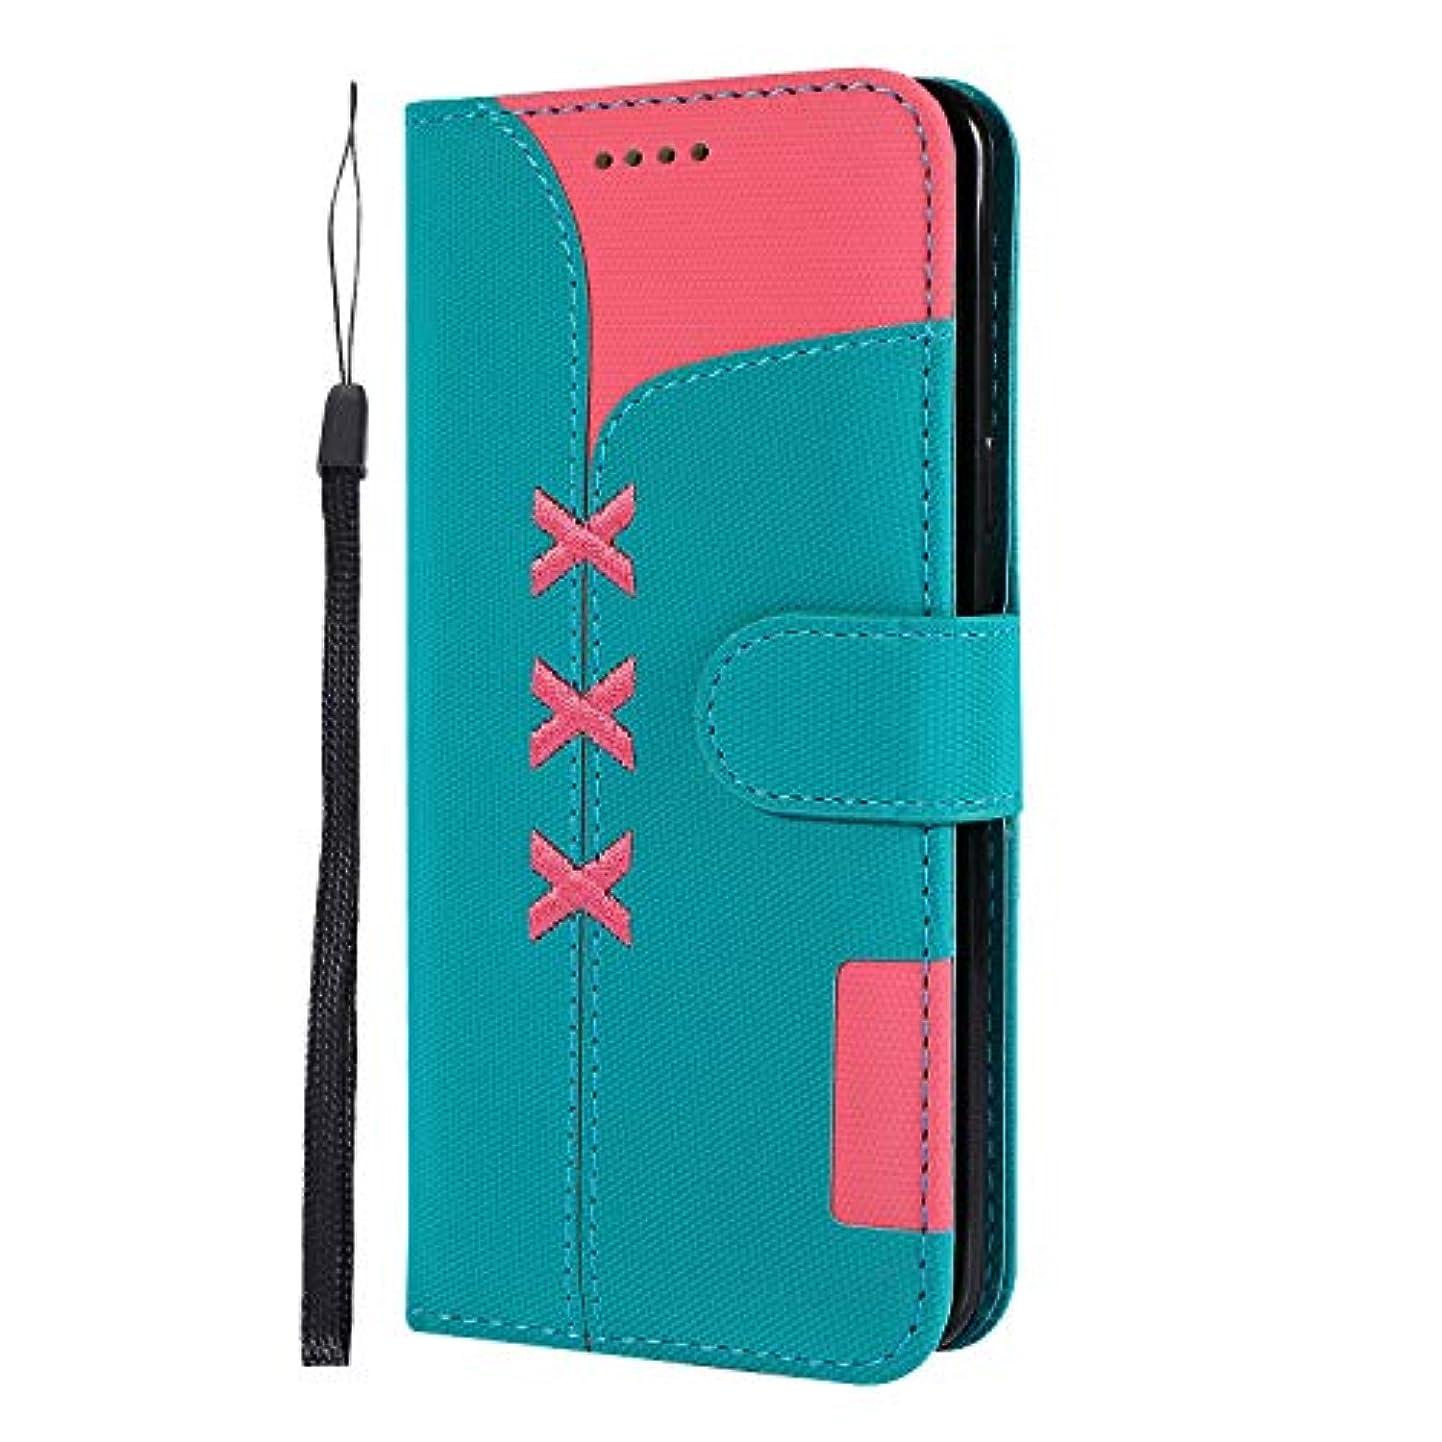 Lomogo Galaxy S9 / docomo SC-02K / au SCV38 ケース 手帳型 耐衝撃 レザーケース 財布型 カードポケット スタンド機能 マグネット式 ギャラクシーS9 手帳型ケース カバー 人気 - LOGHU040227 青